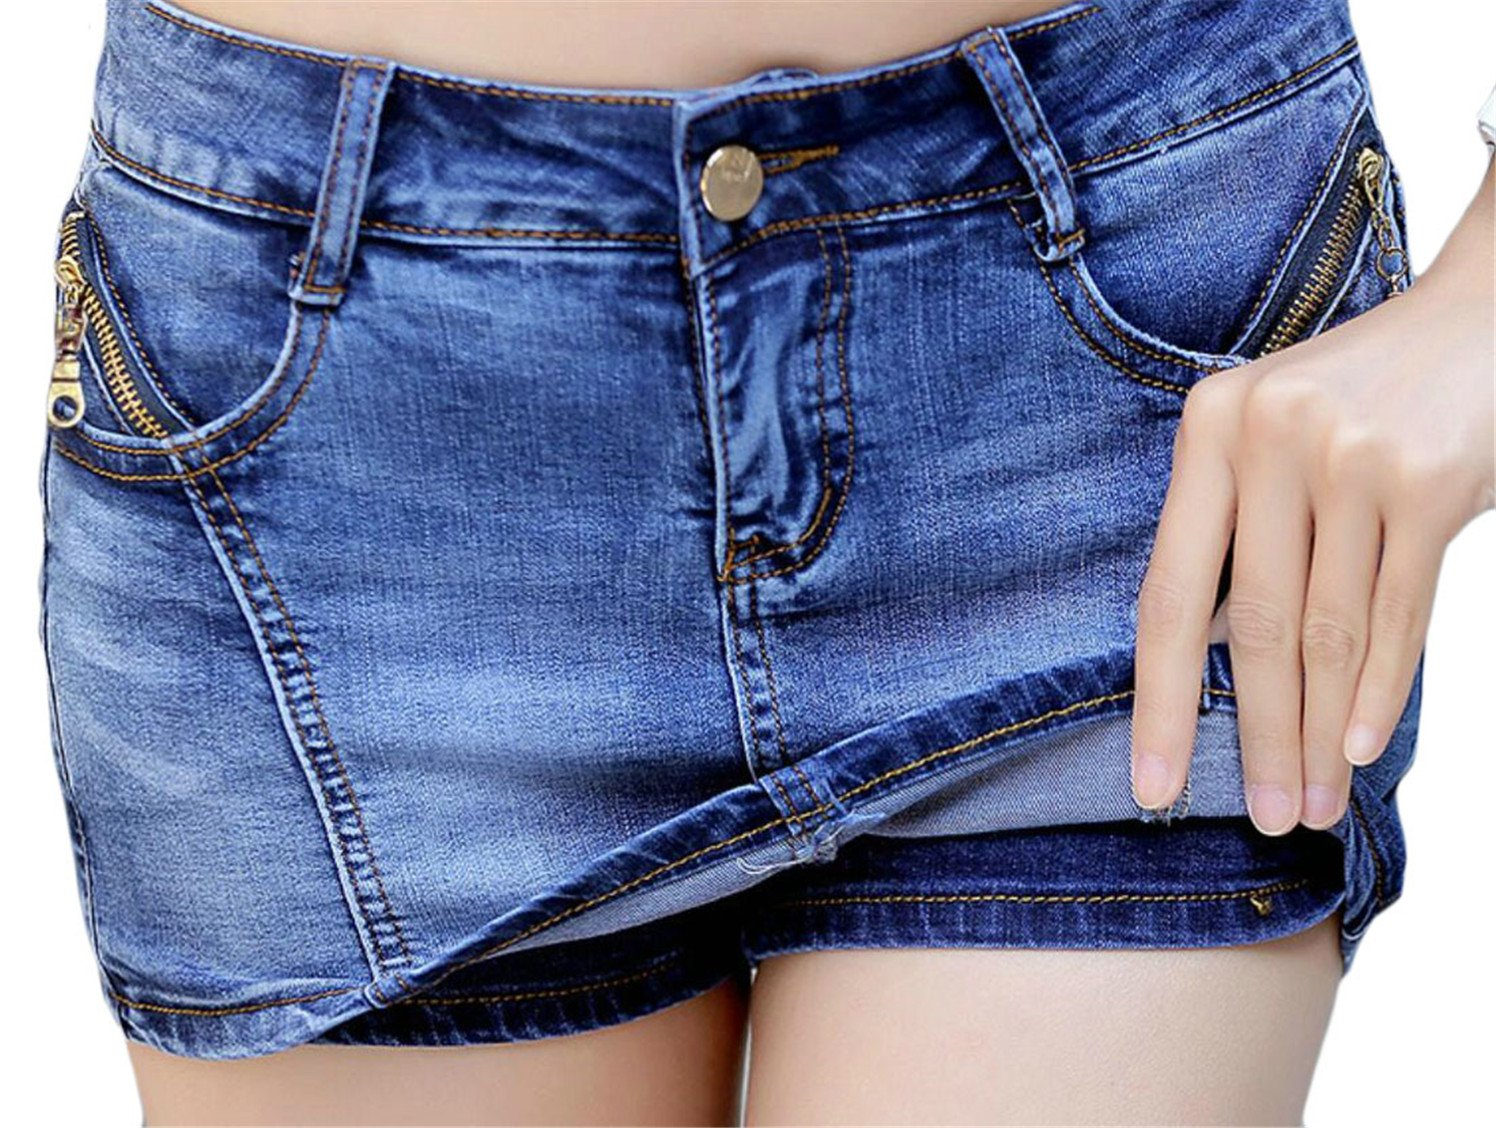 Generic Womens High Waist Luscious Curvy Stretch Denim Bootcut Skirt/Shorts 1 XL